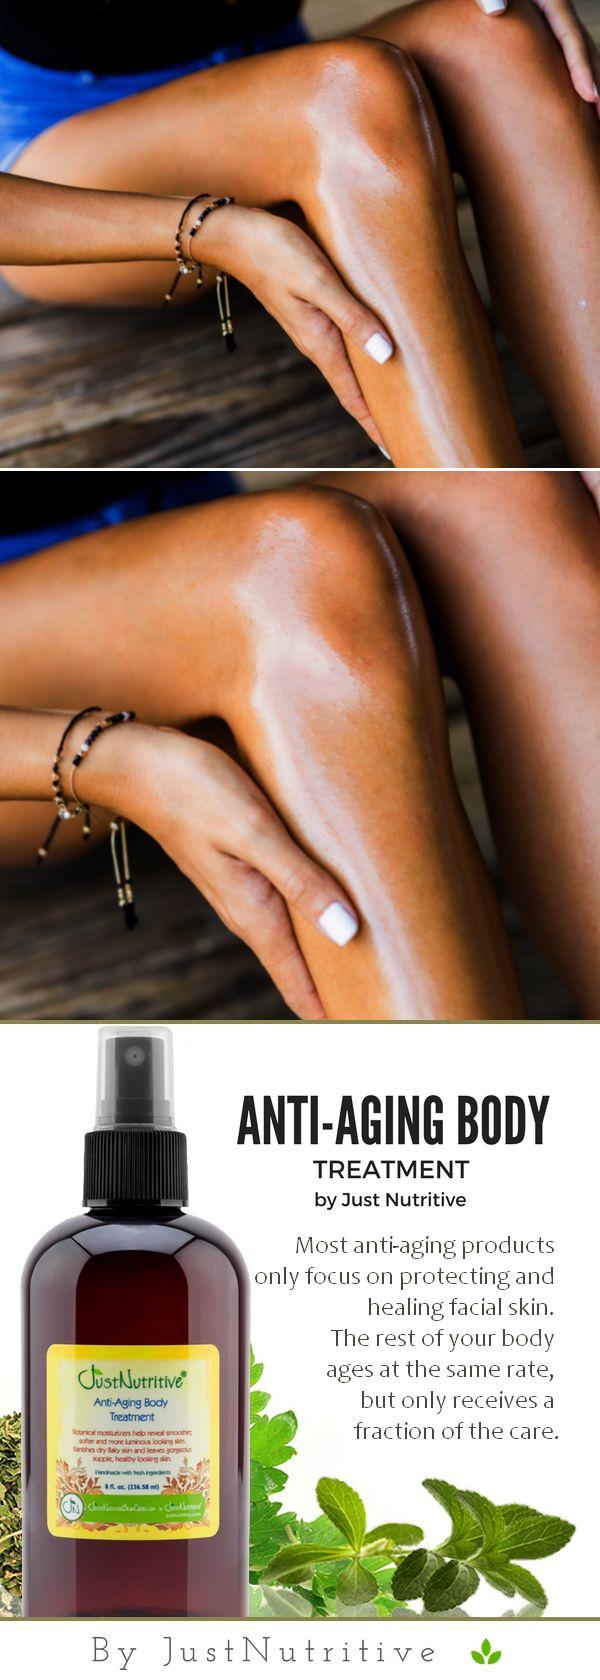 ANTI-AGING BODY TREATMENT